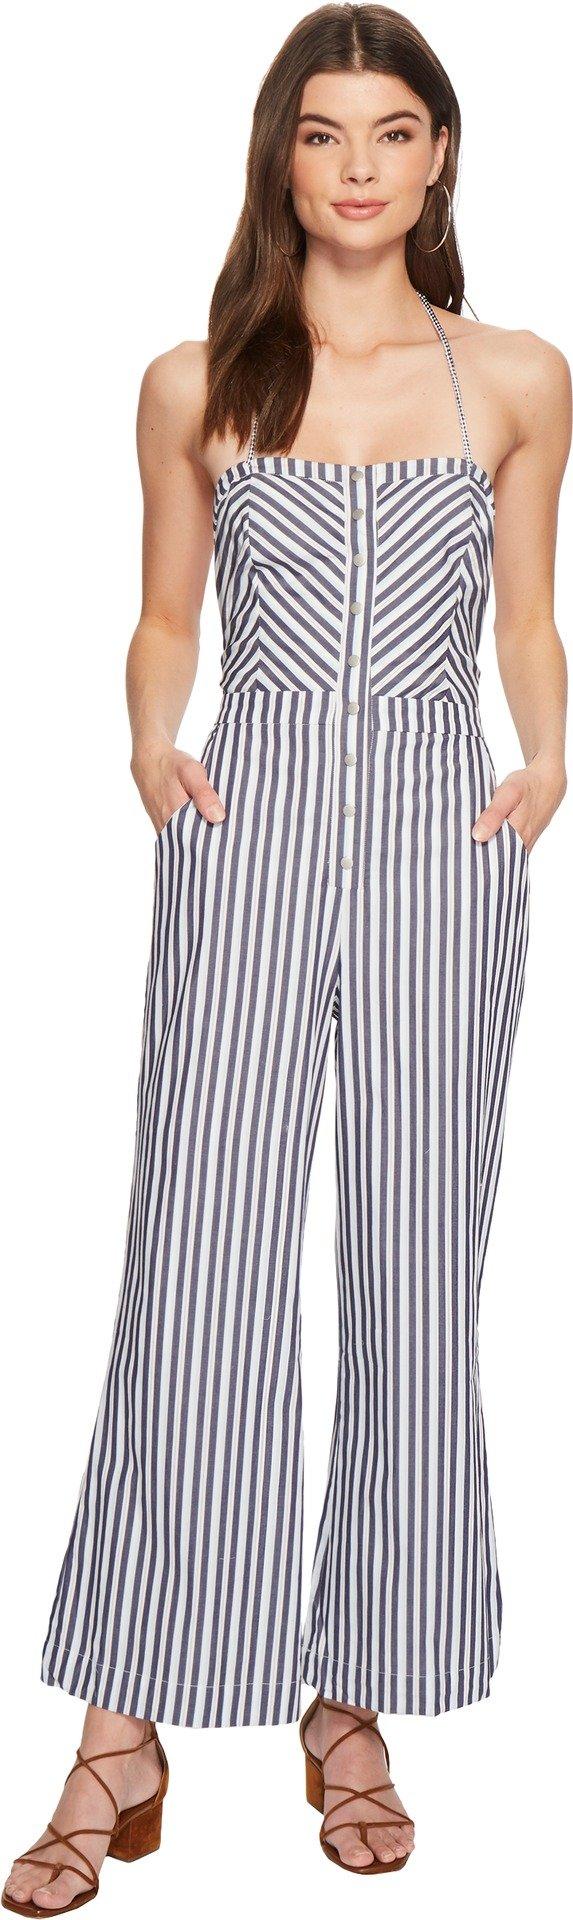 The Jetset Diaries Women's Cornflower Jumpsuit Stripe Small